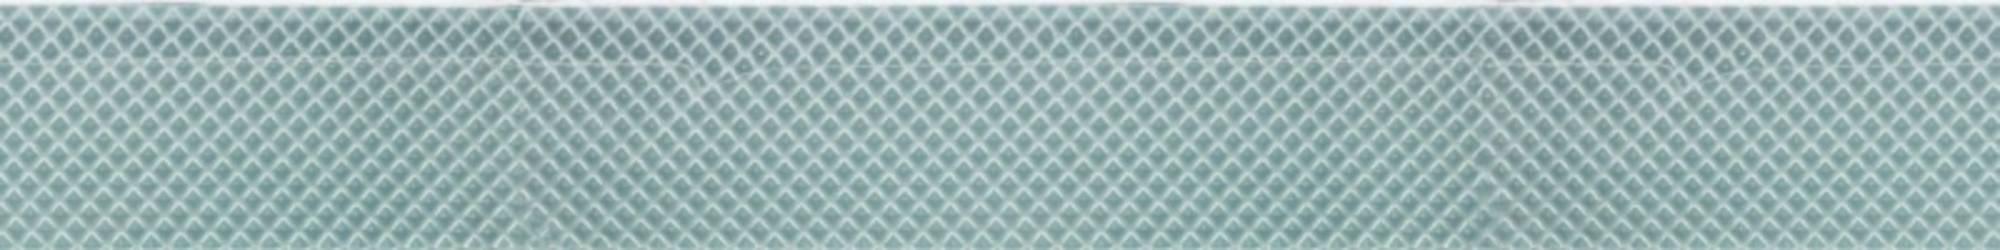 Villeroy & boch Cherie tegel strip 7.5x60 cm, glas, seladon